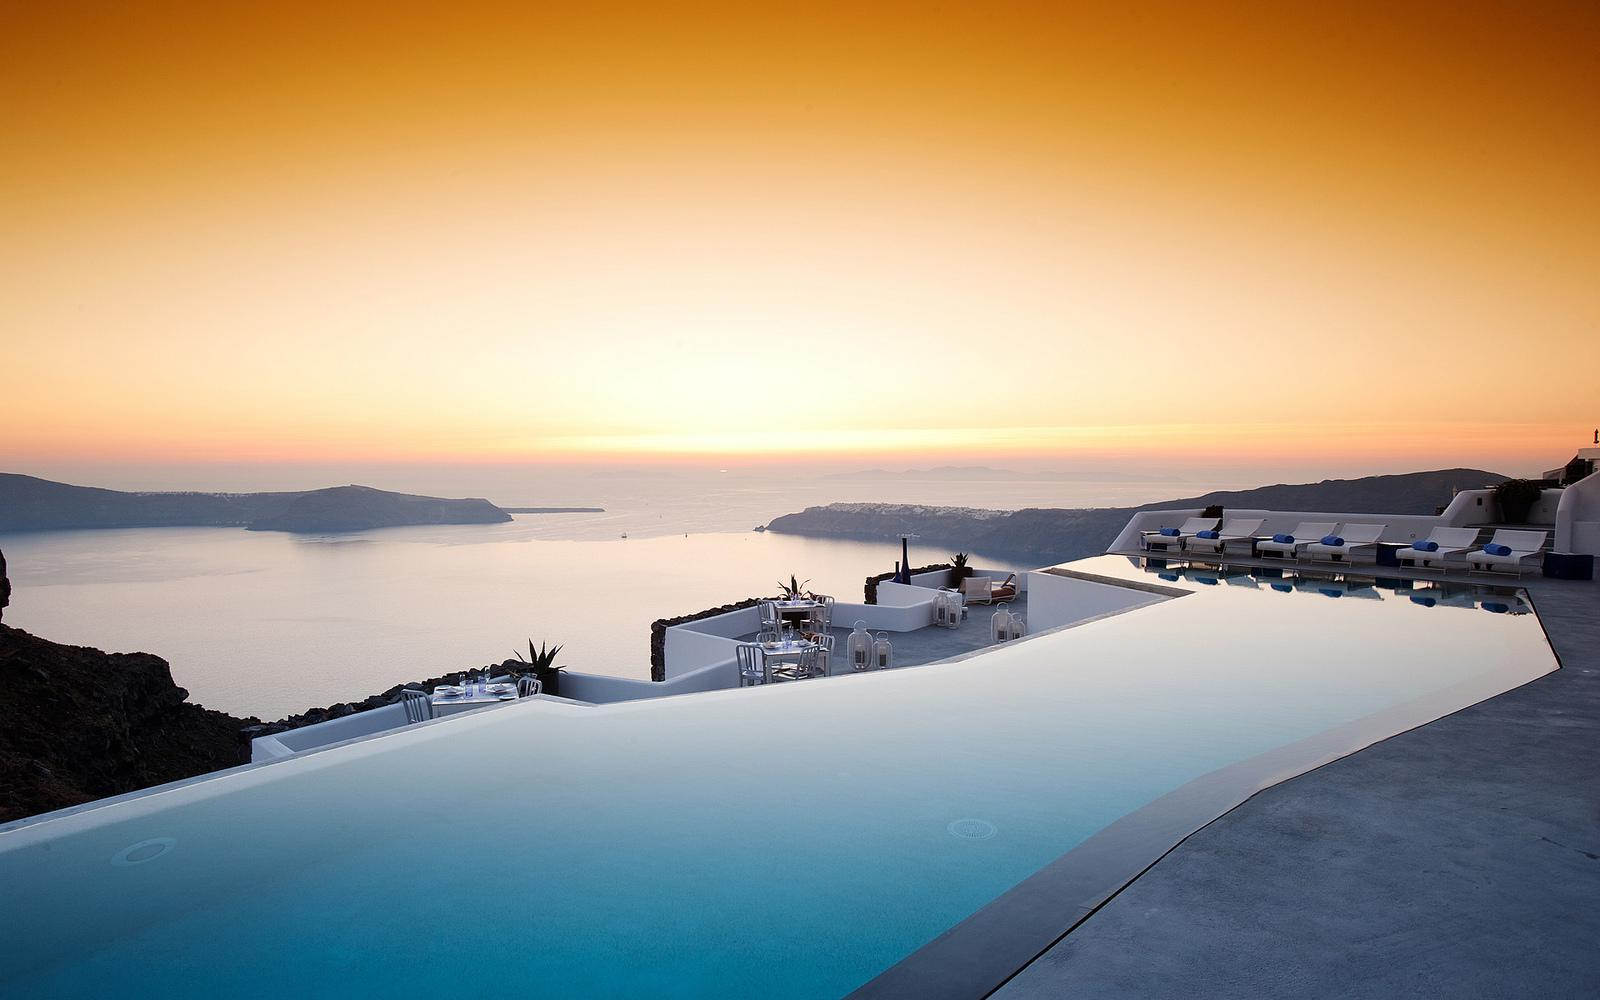 Santorini Sunset HD Wallpaper Background Images 1600x1000